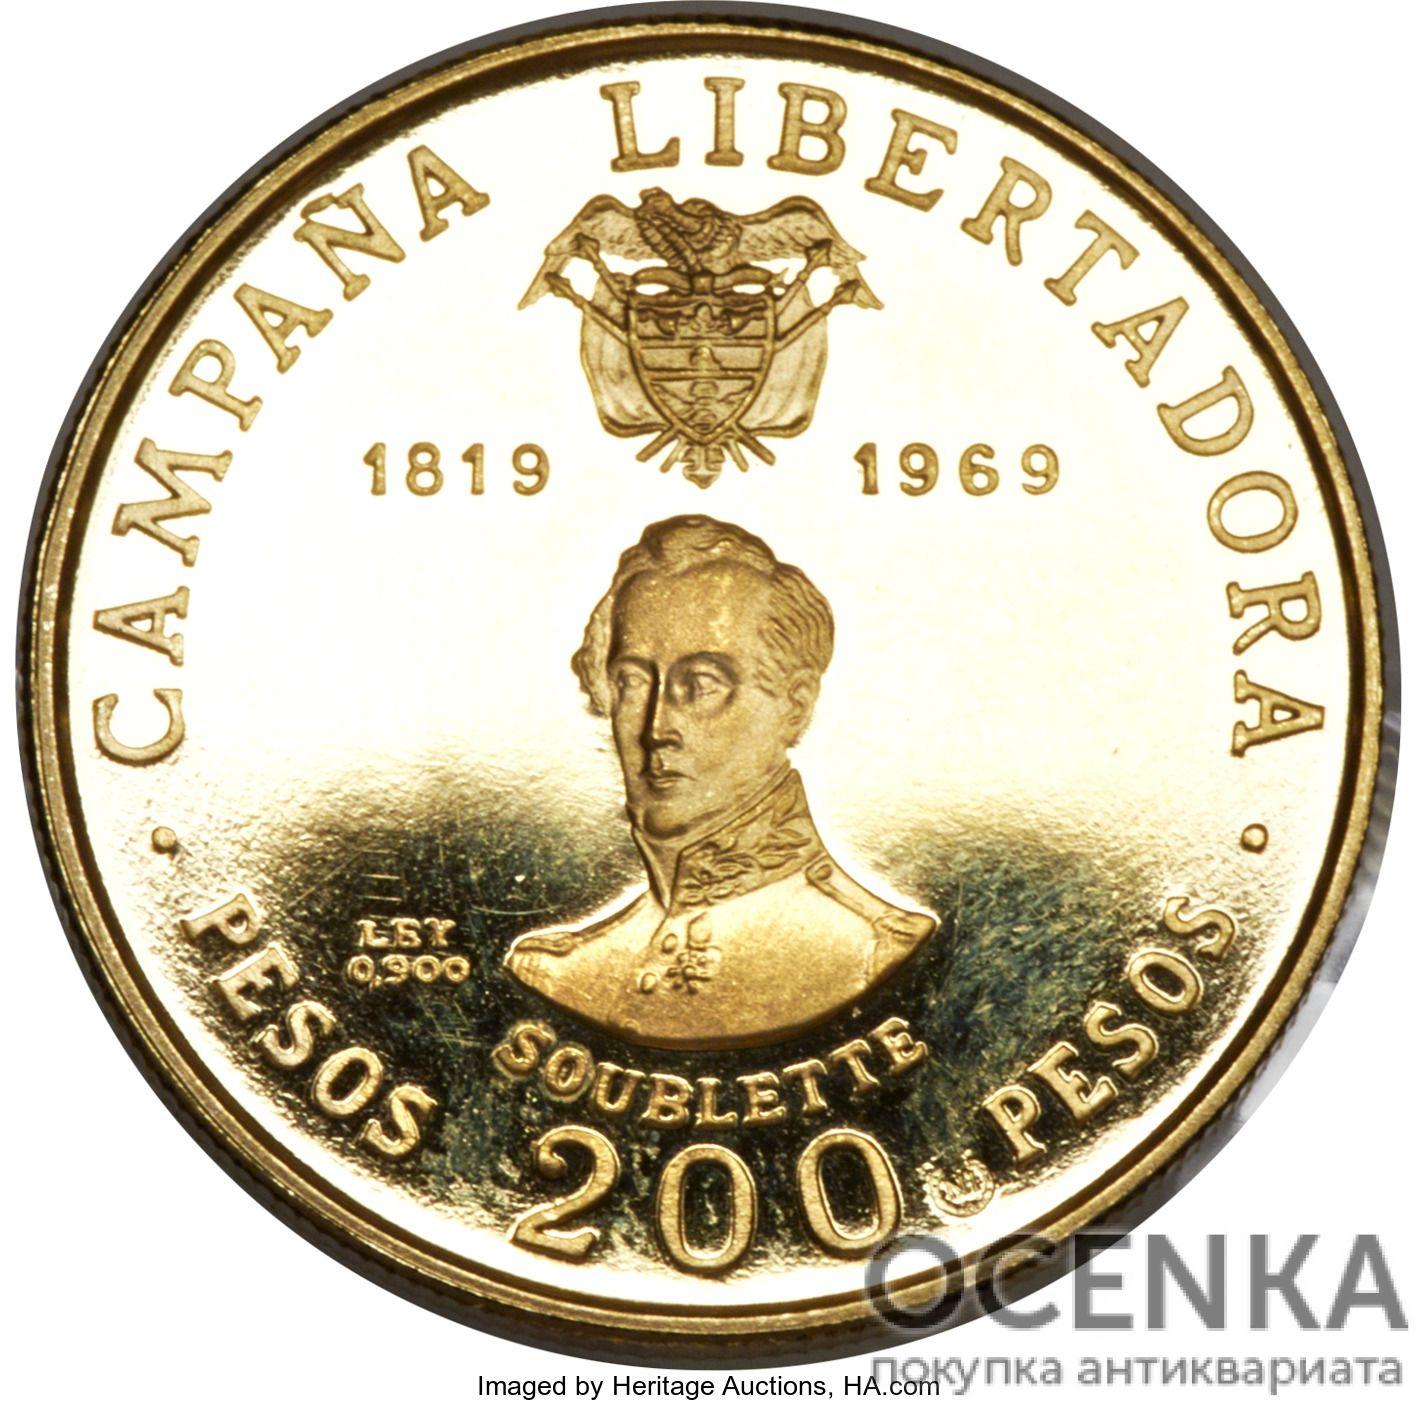 Золотая монета 200 Песо (200 Pesos) Колумбия - 2